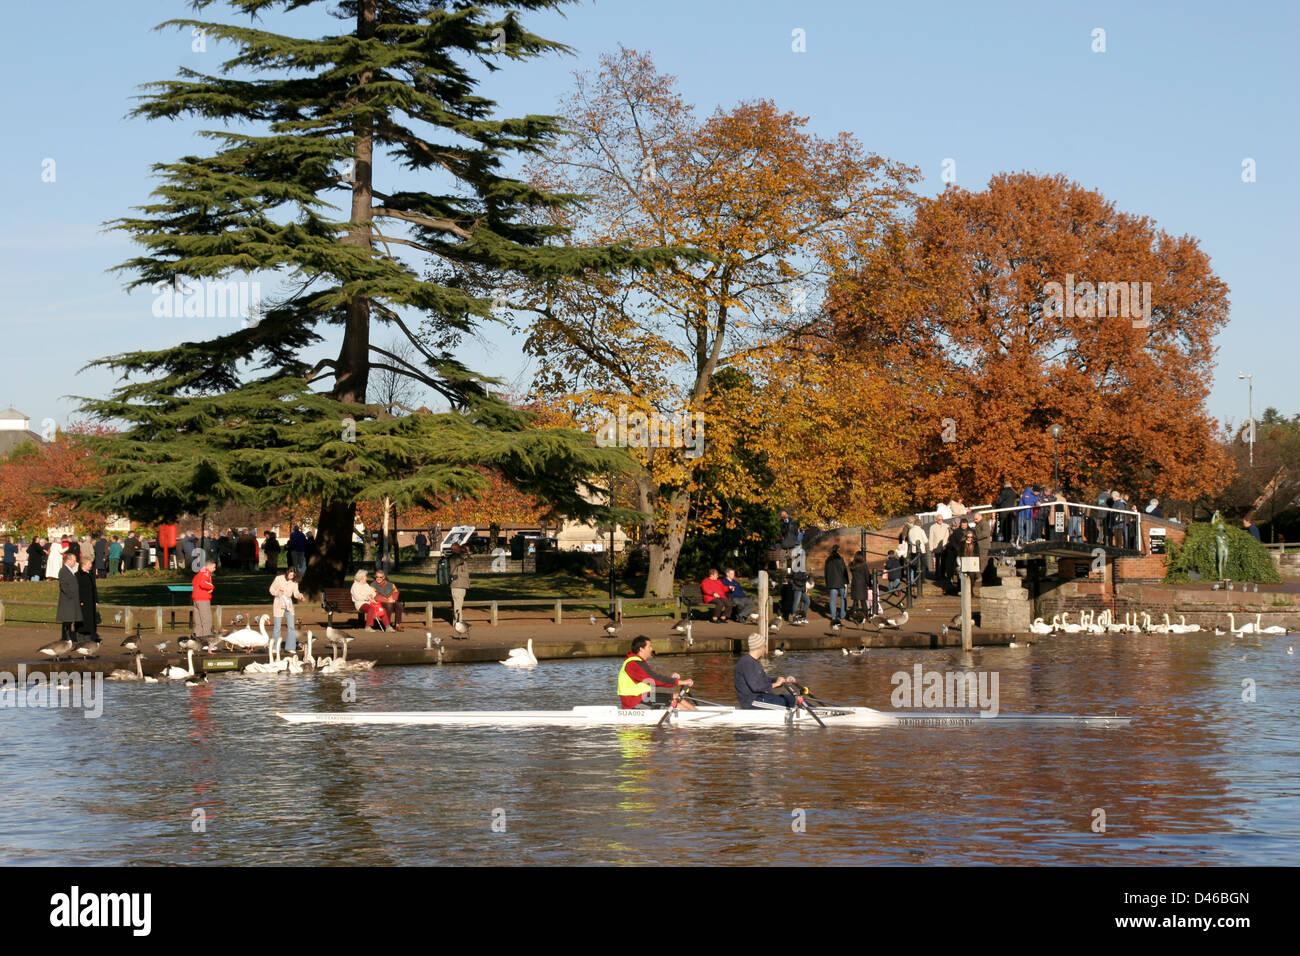 Autumn River Avon scene Stratford Upon Avon Warwickshire England UK - Stock Image